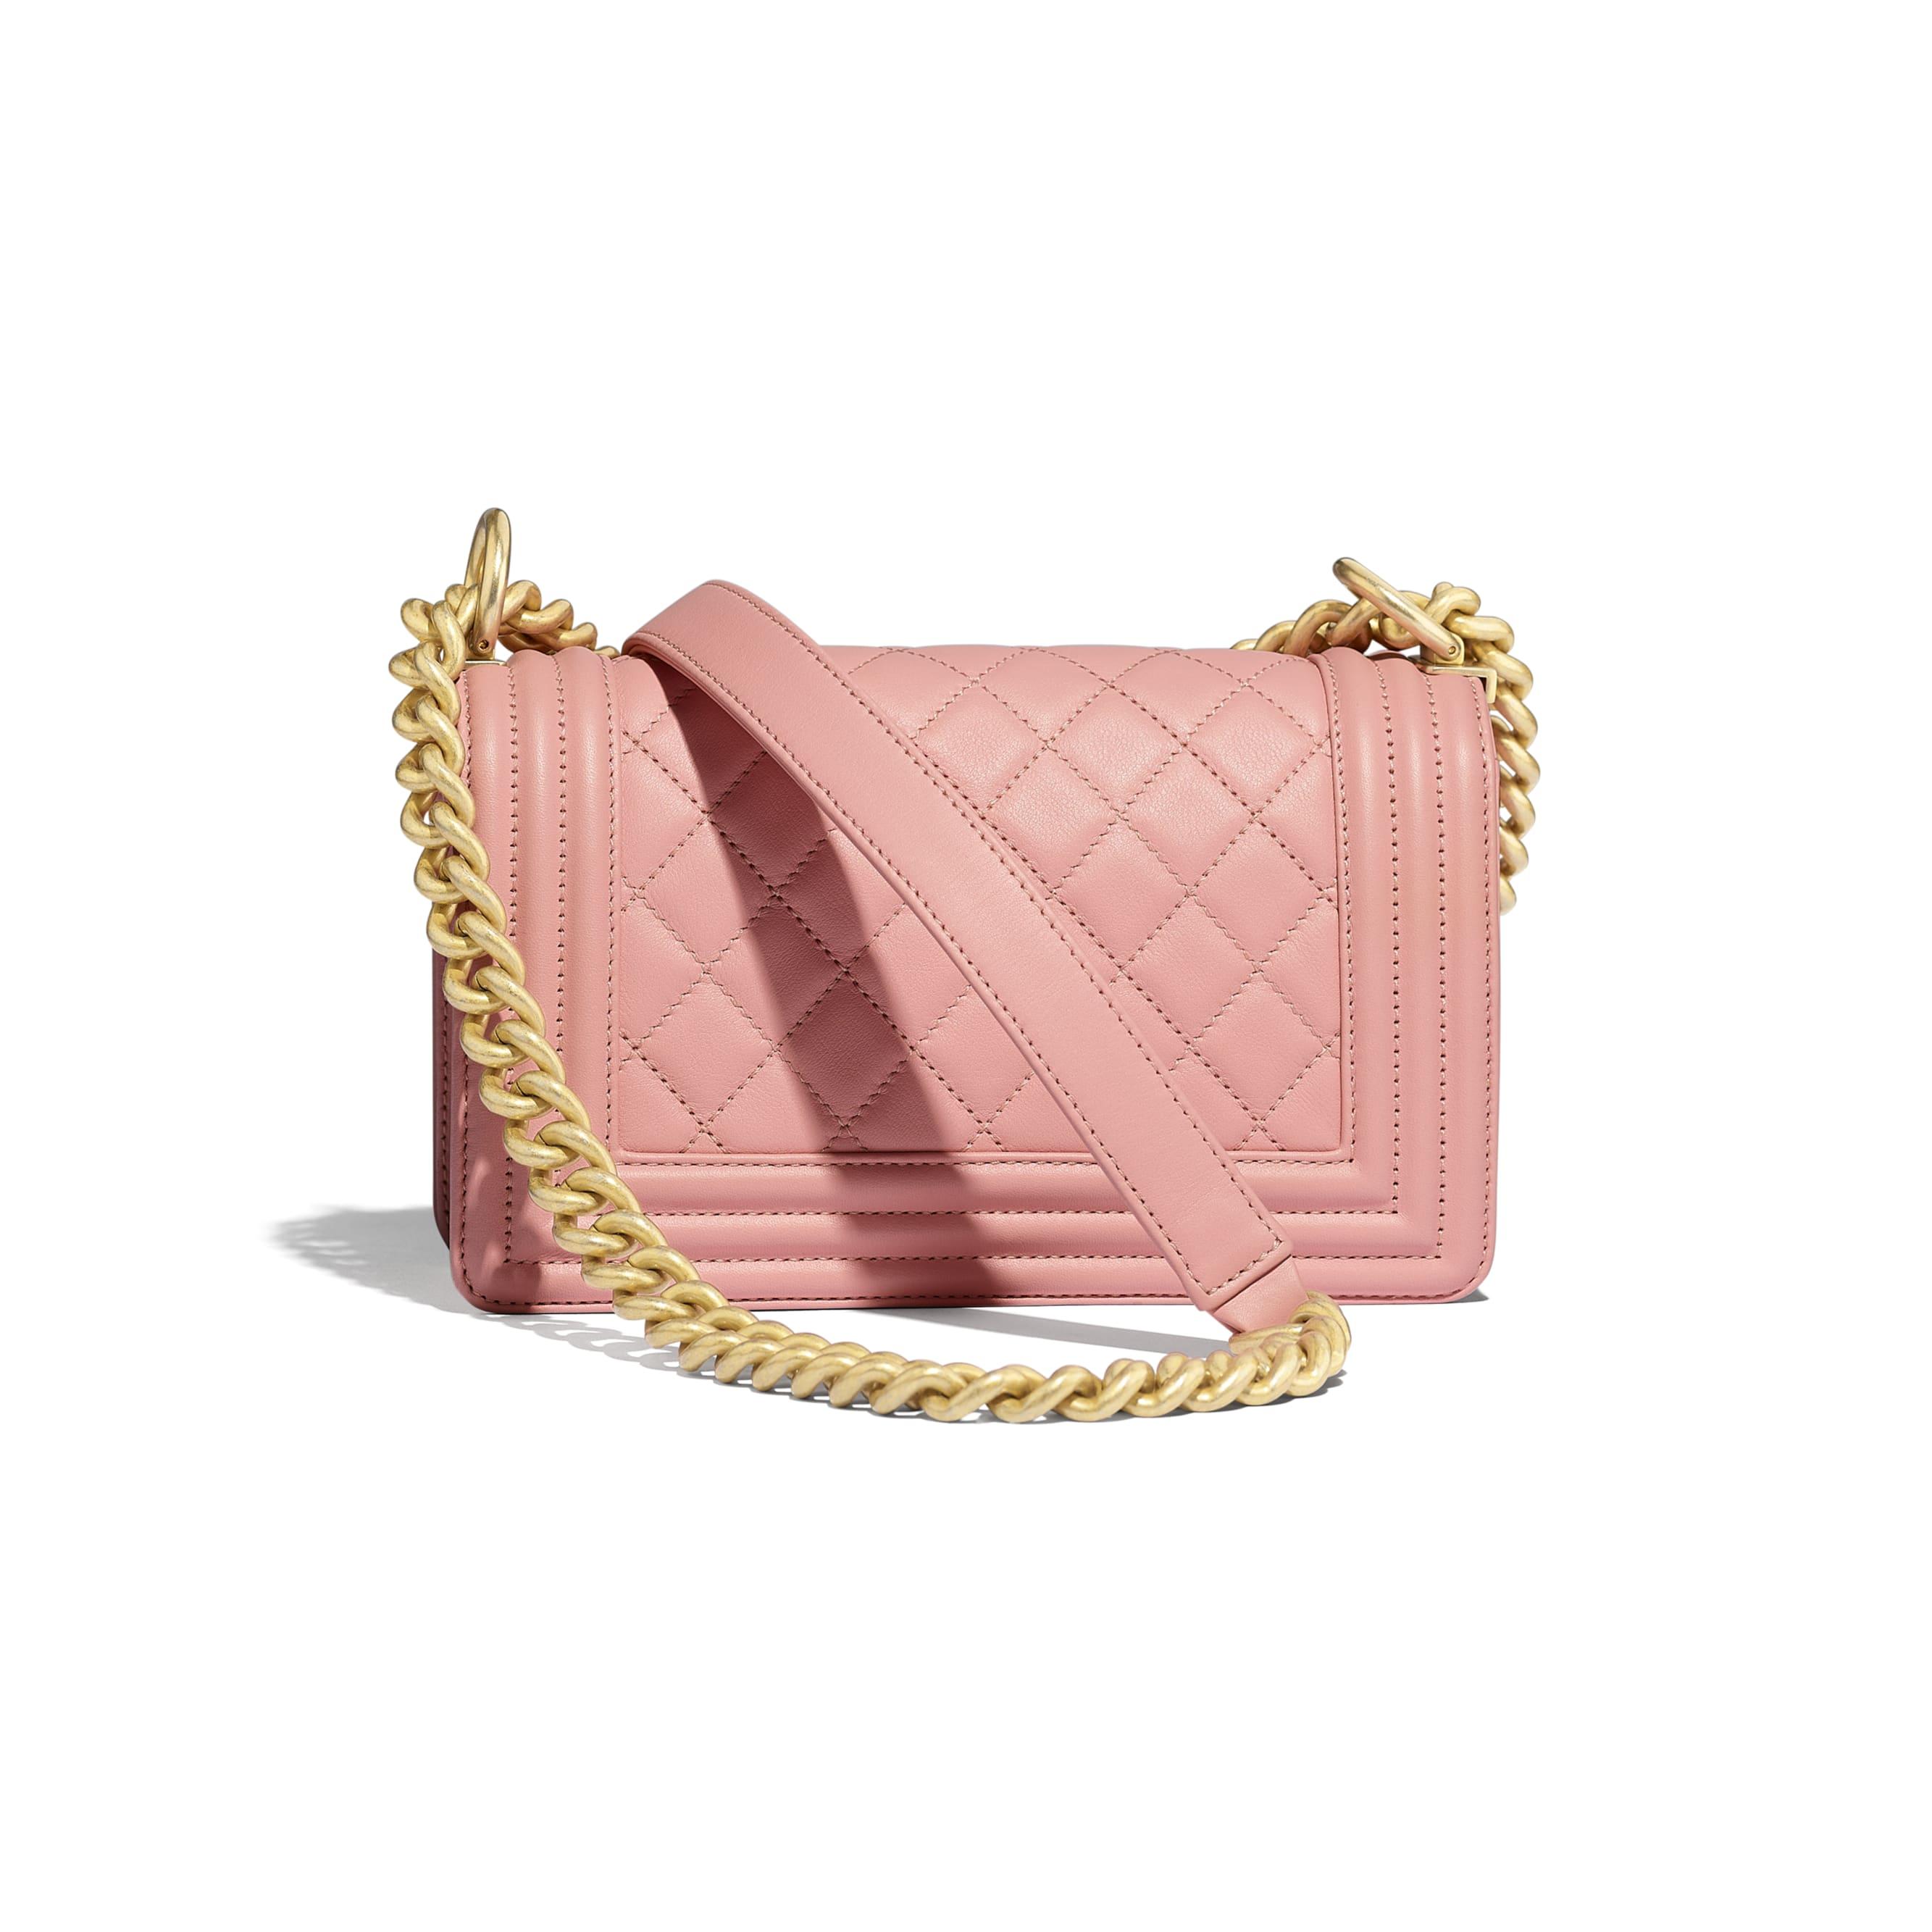 Small BOY CHANEL Handbag - Pink - Calfskin & Gold-Tone Metal - Alternative view - see standard sized version